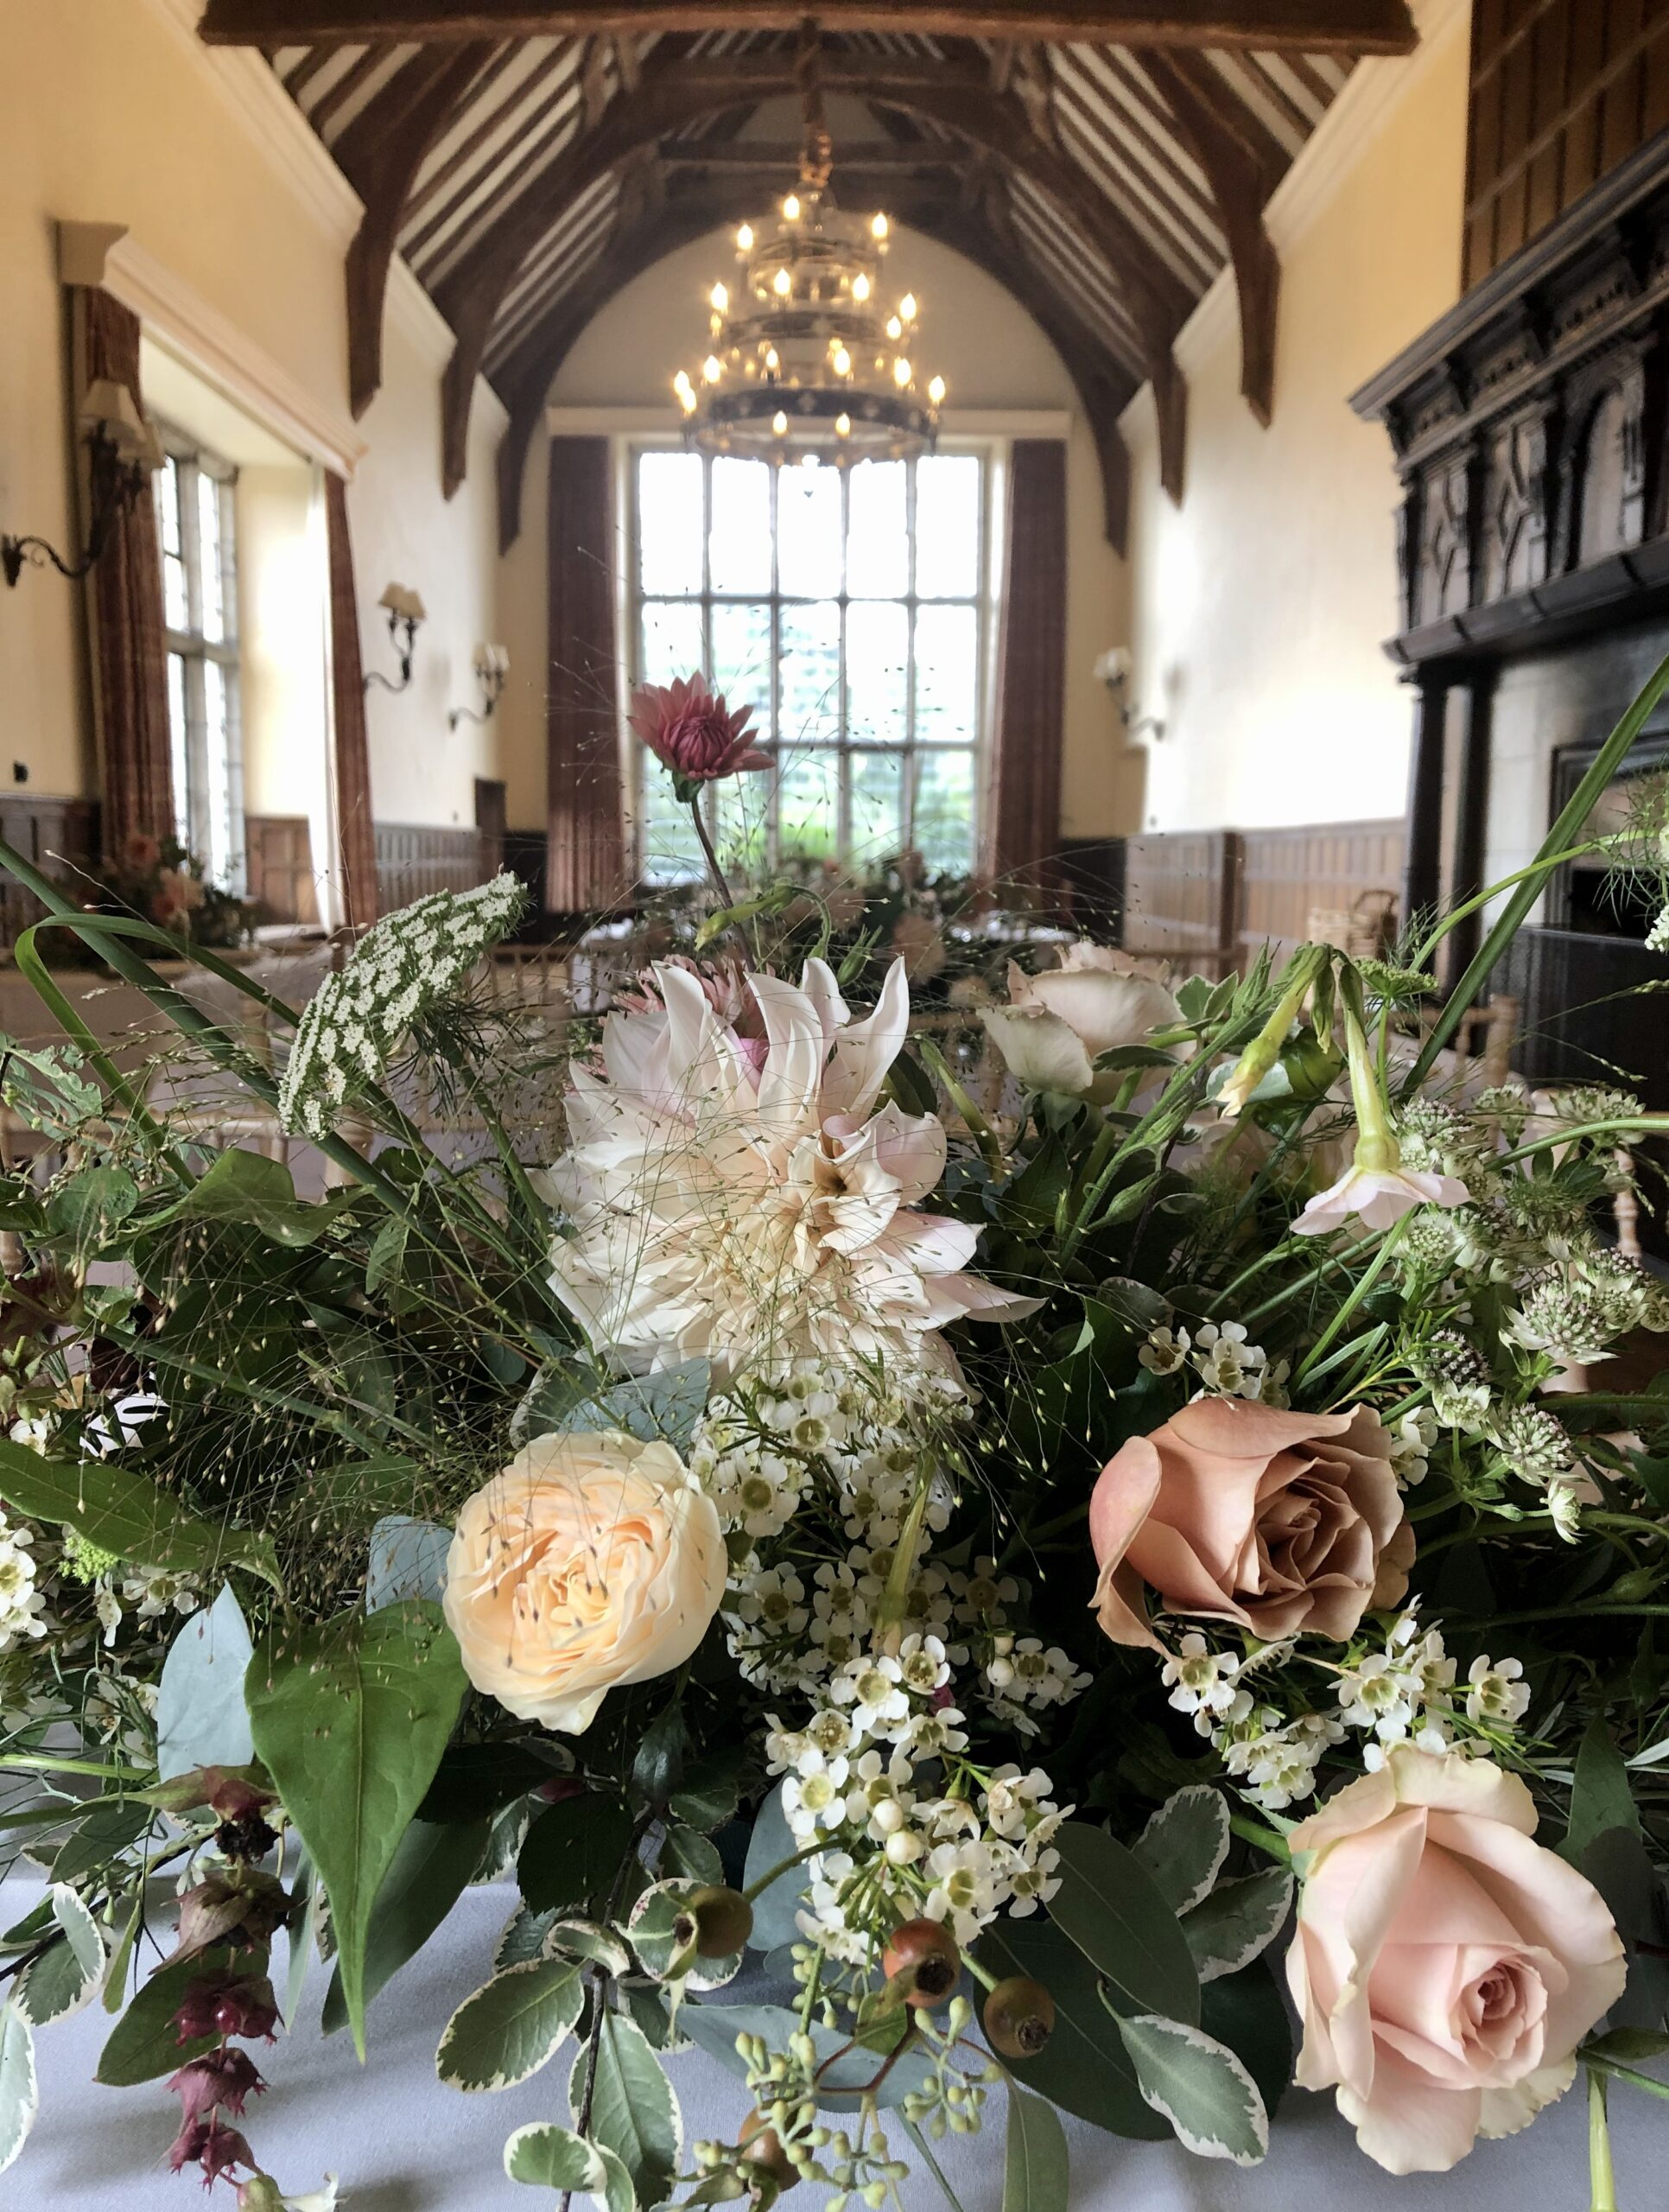 Floral centrepiece for wedding breakfast